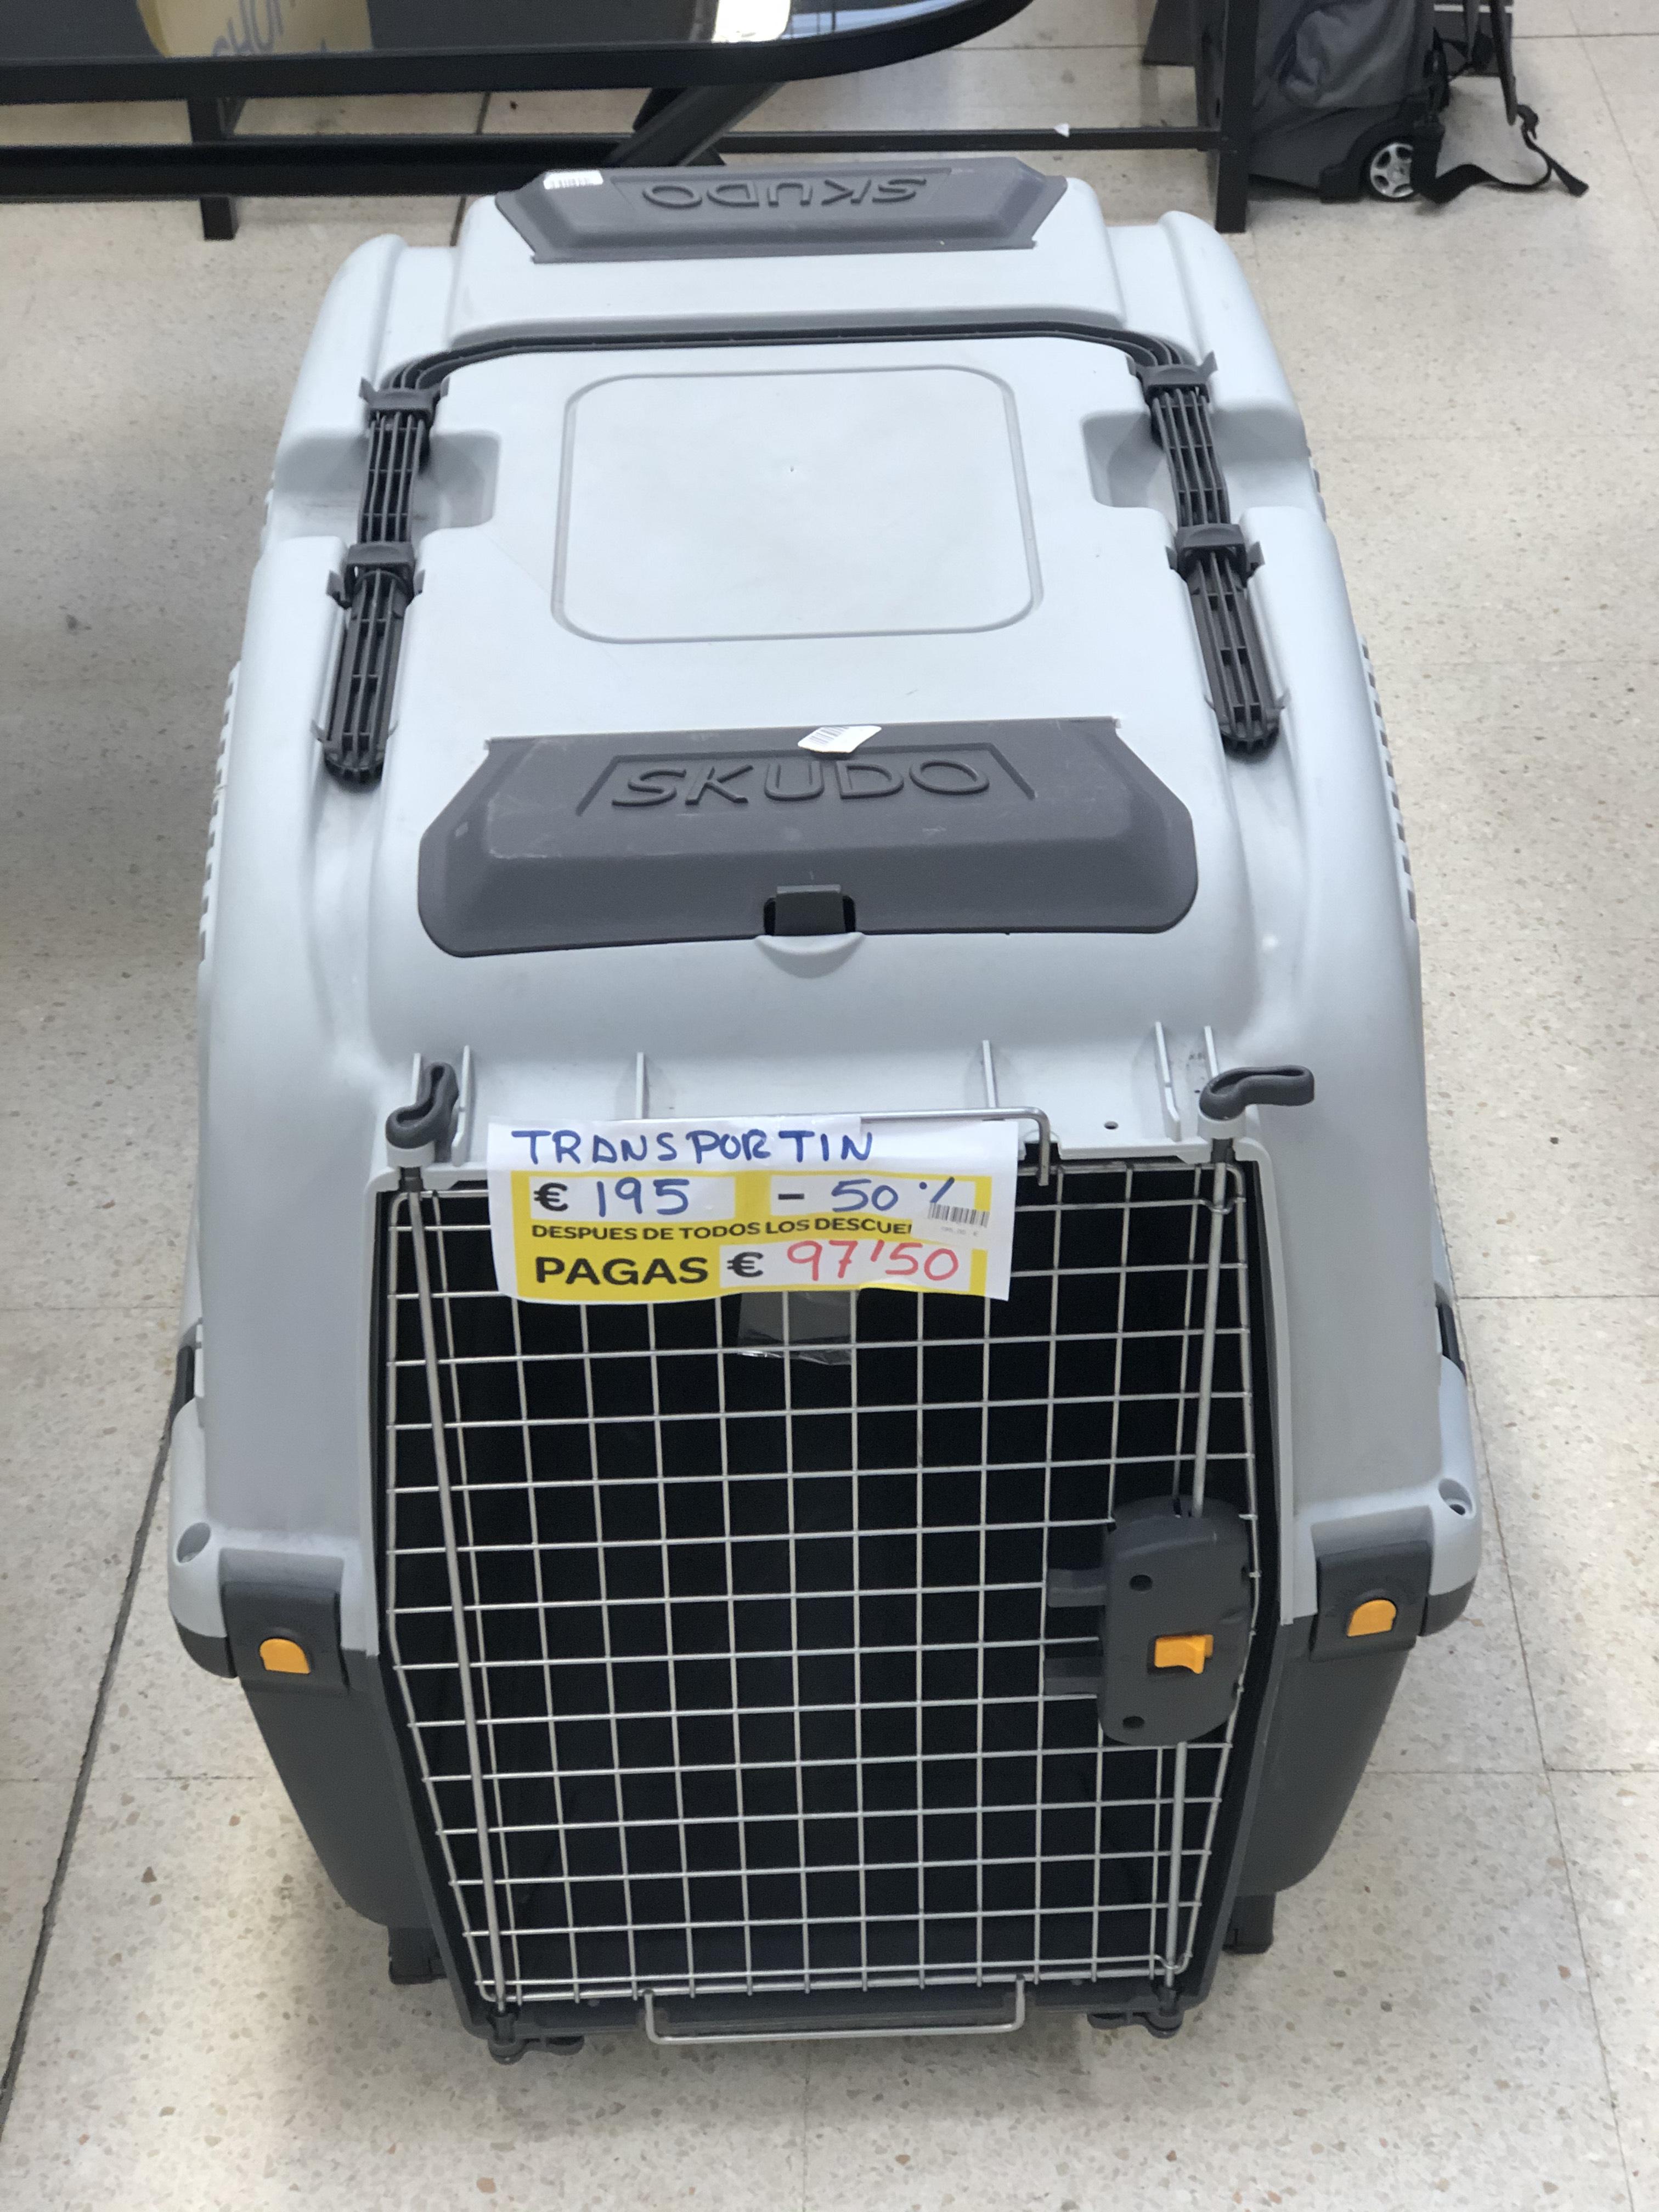 Transportin de animales